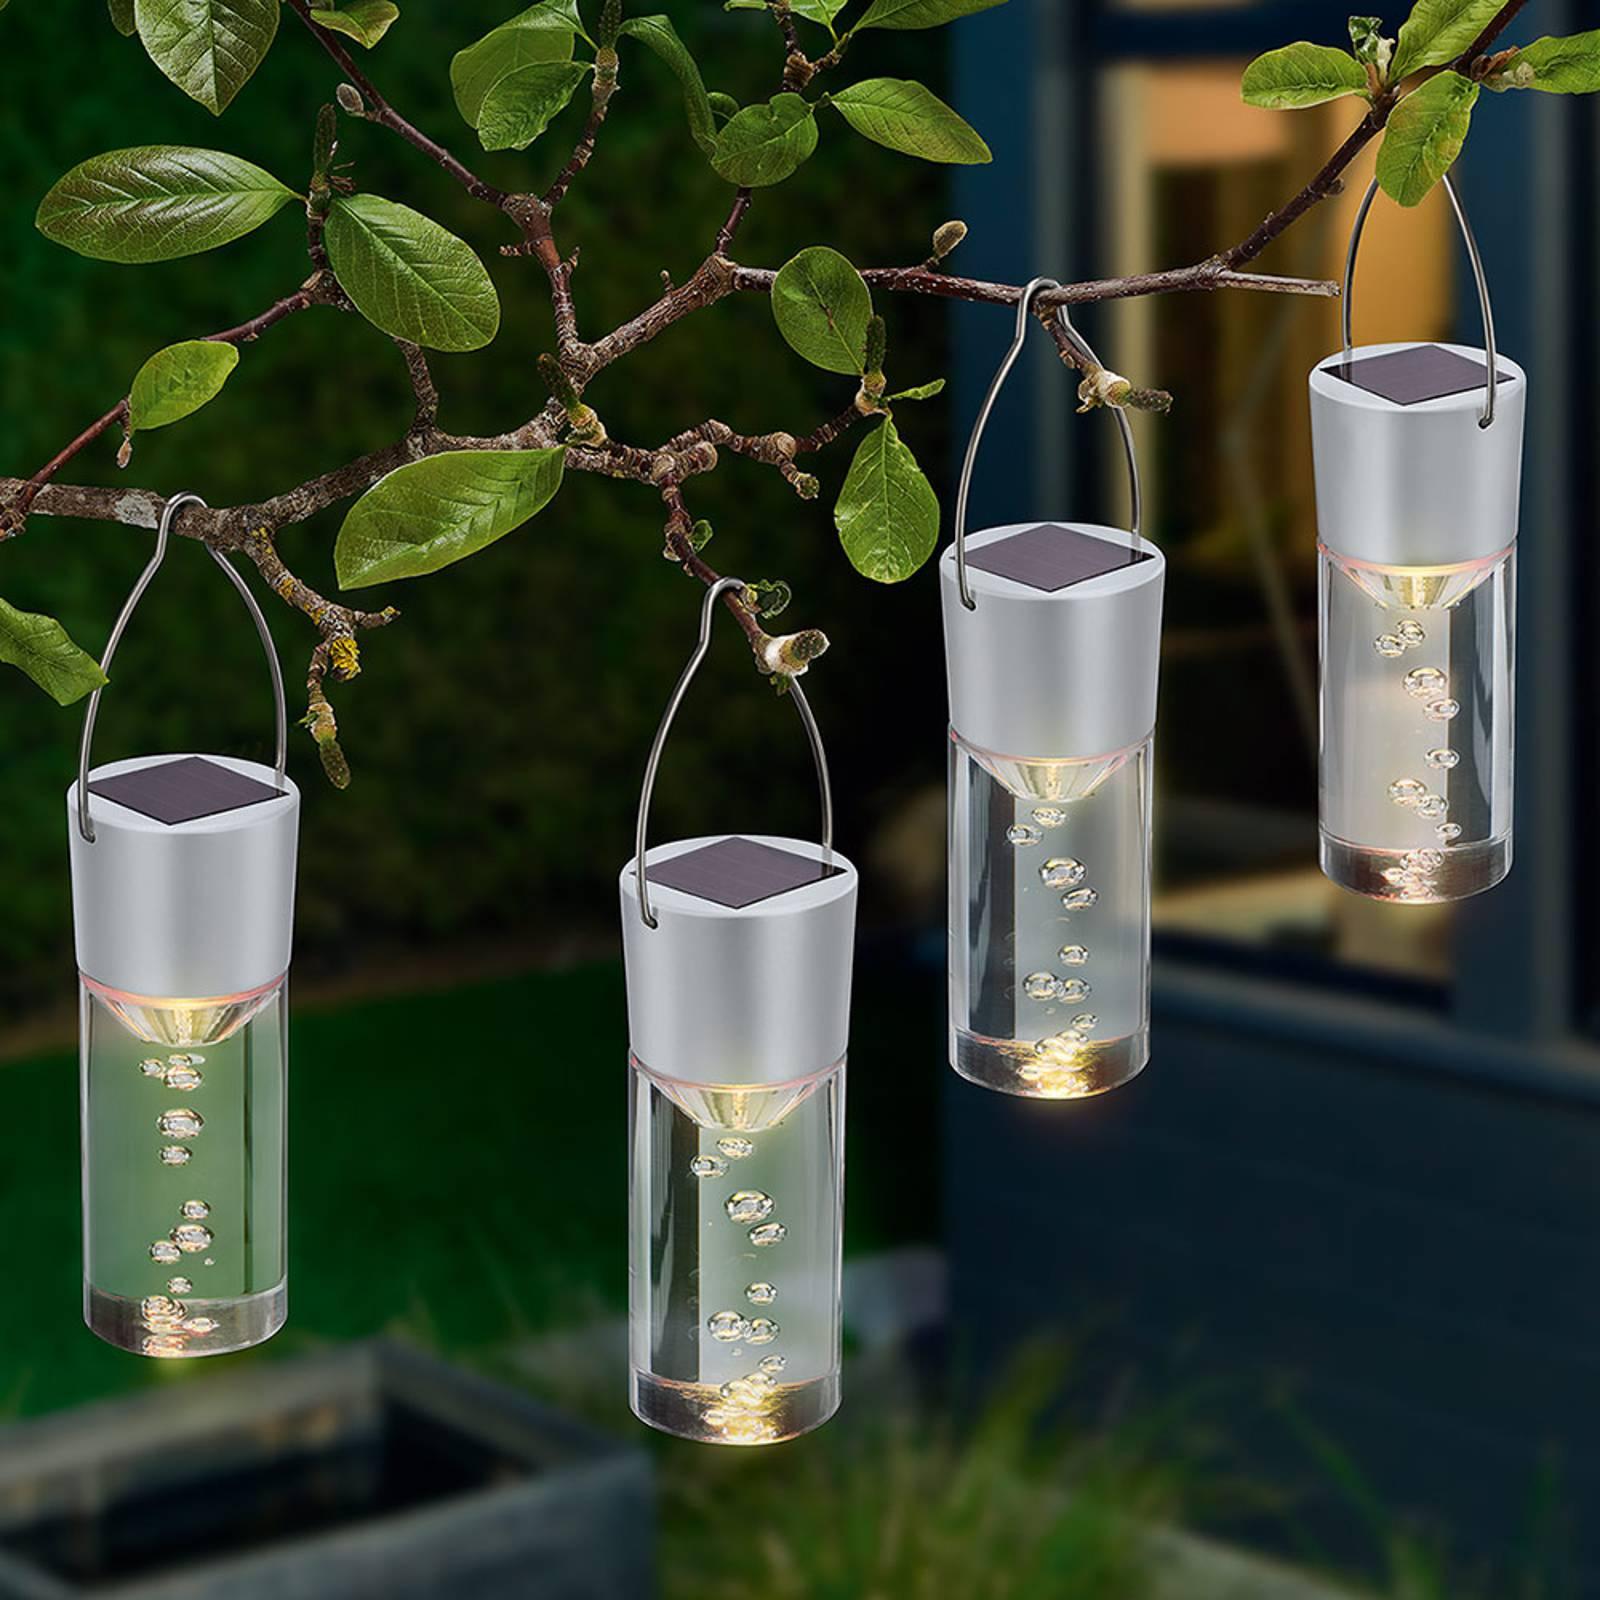 Set di lampade decorative solari Smart Sticks